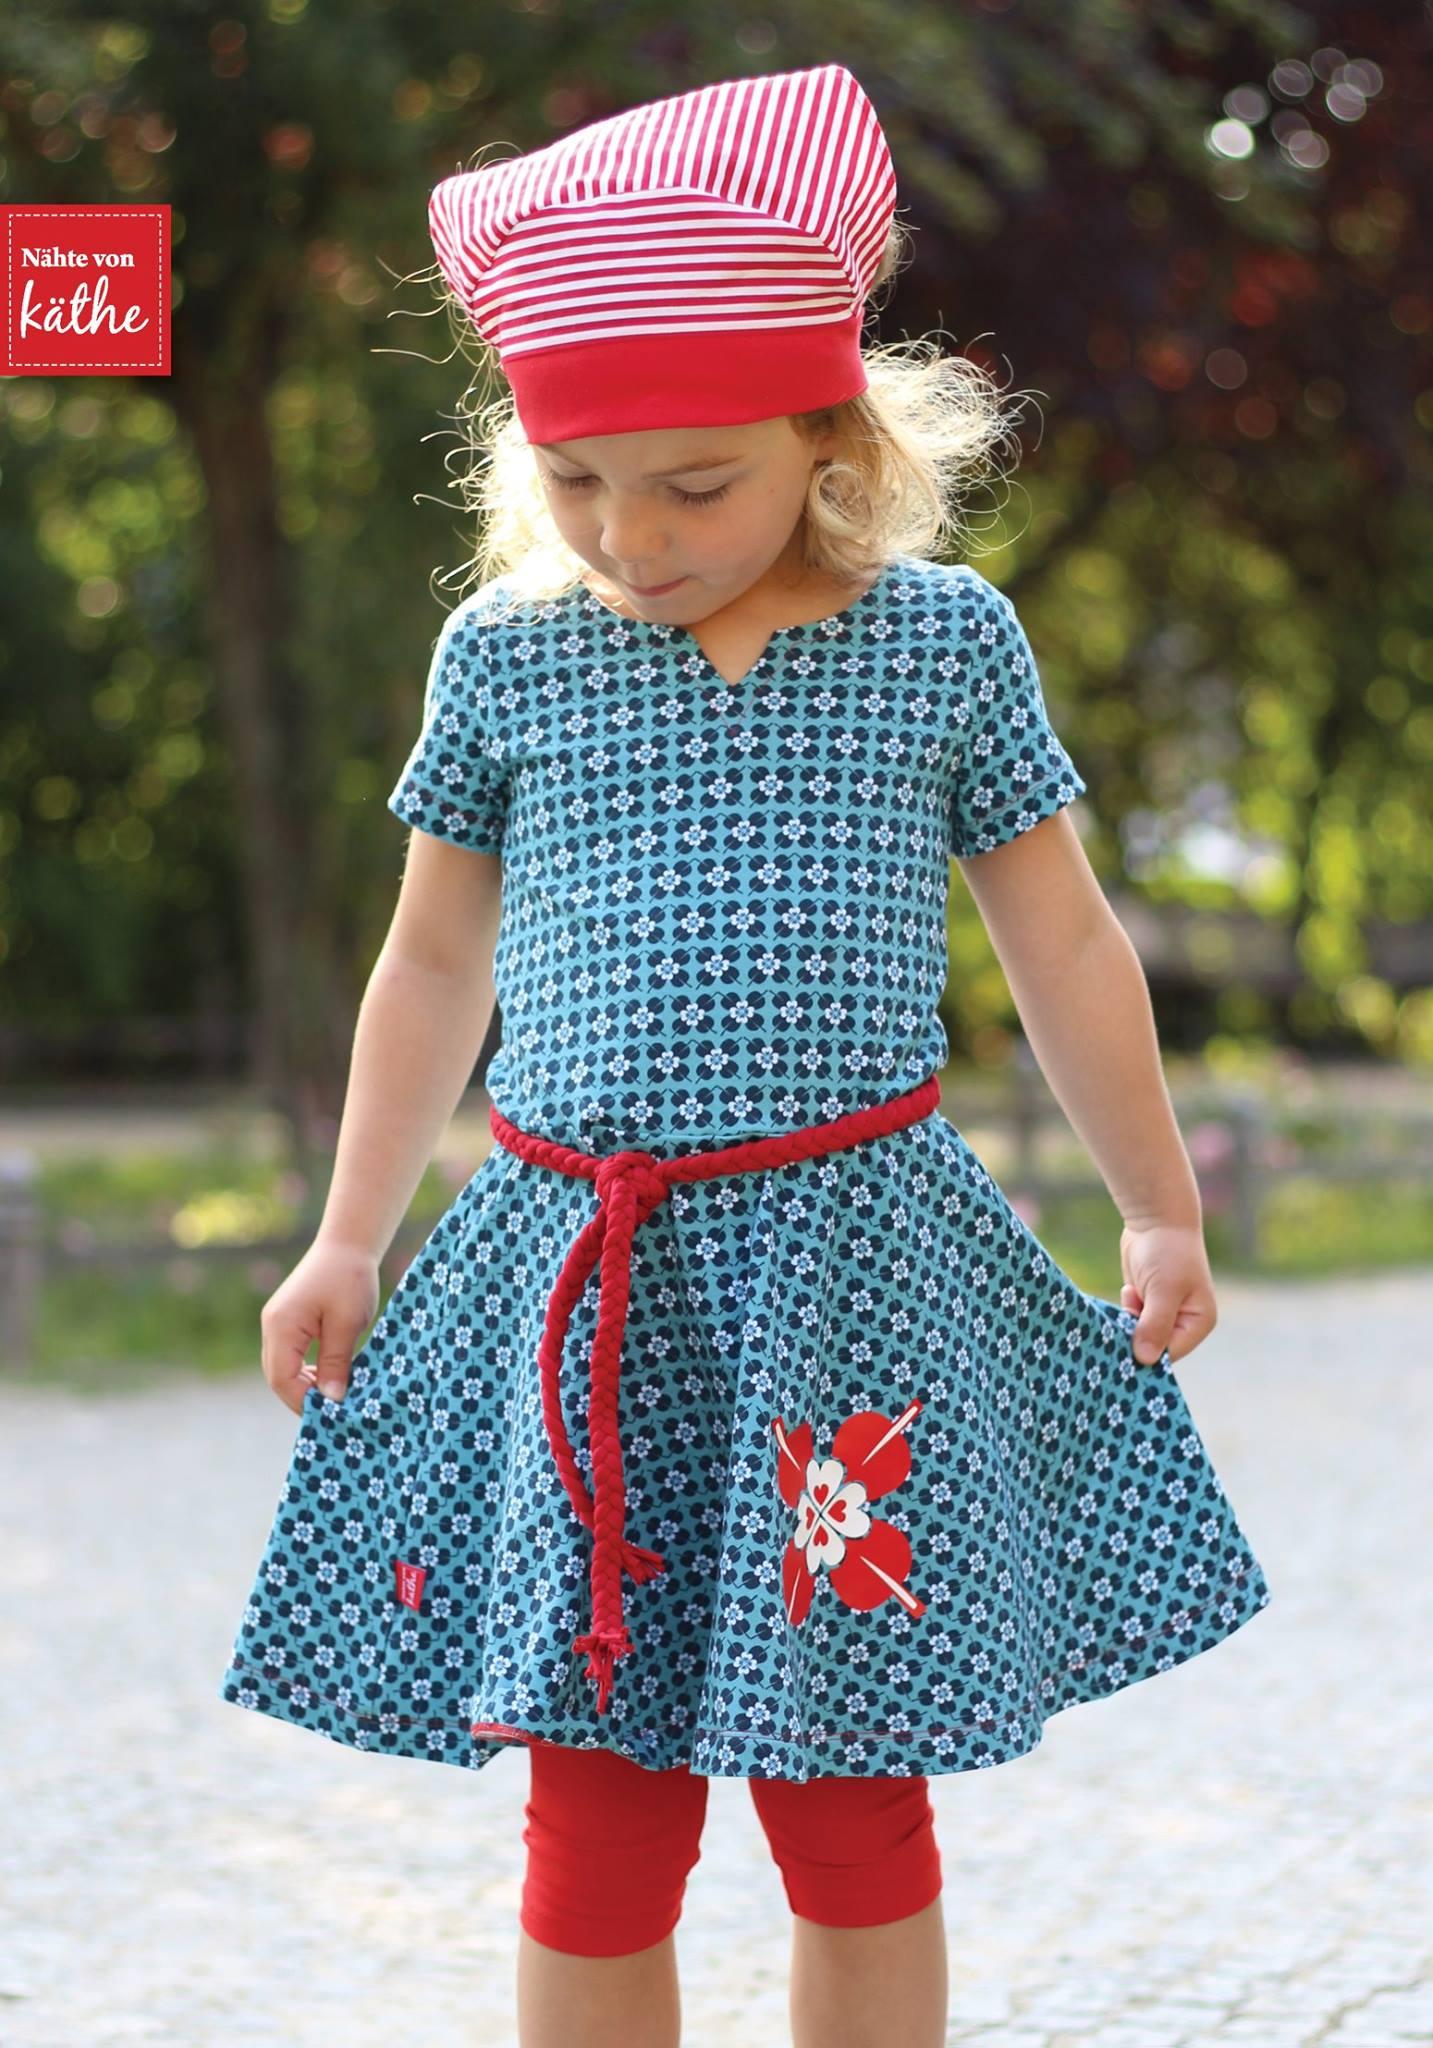 Schnittmuster-nurita-Mädchenkleid-ebook-Jerseykleid-farbenmix_01